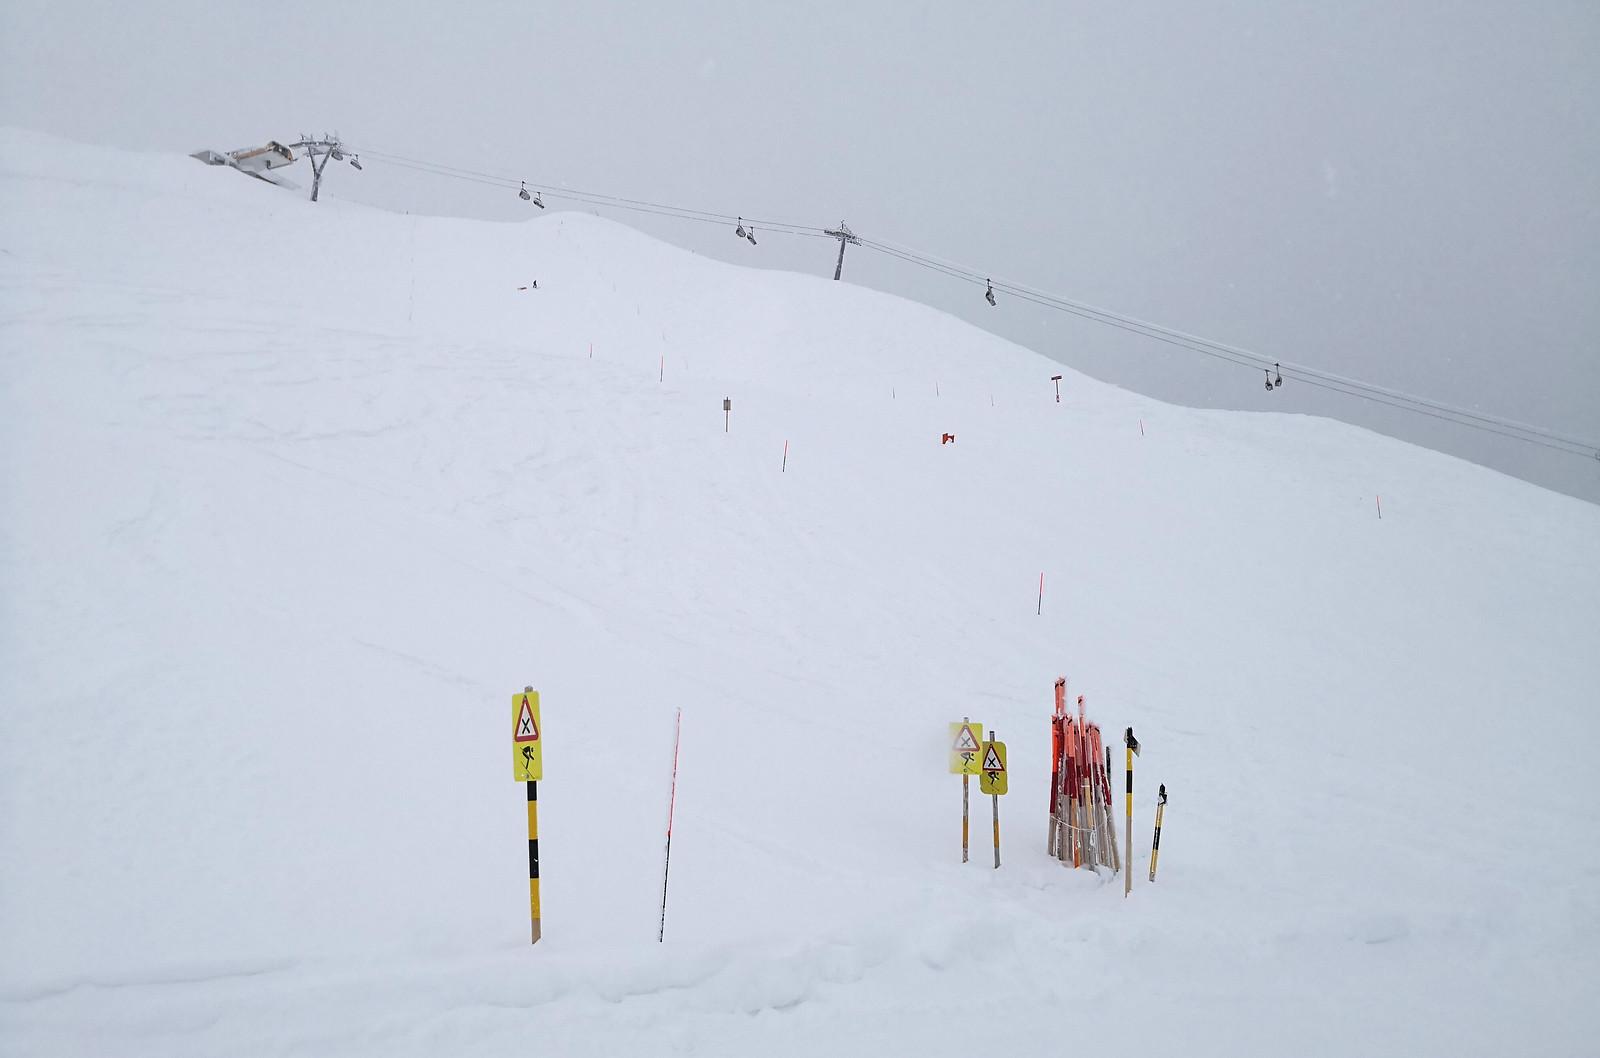 Upper portion of Gätterli piste